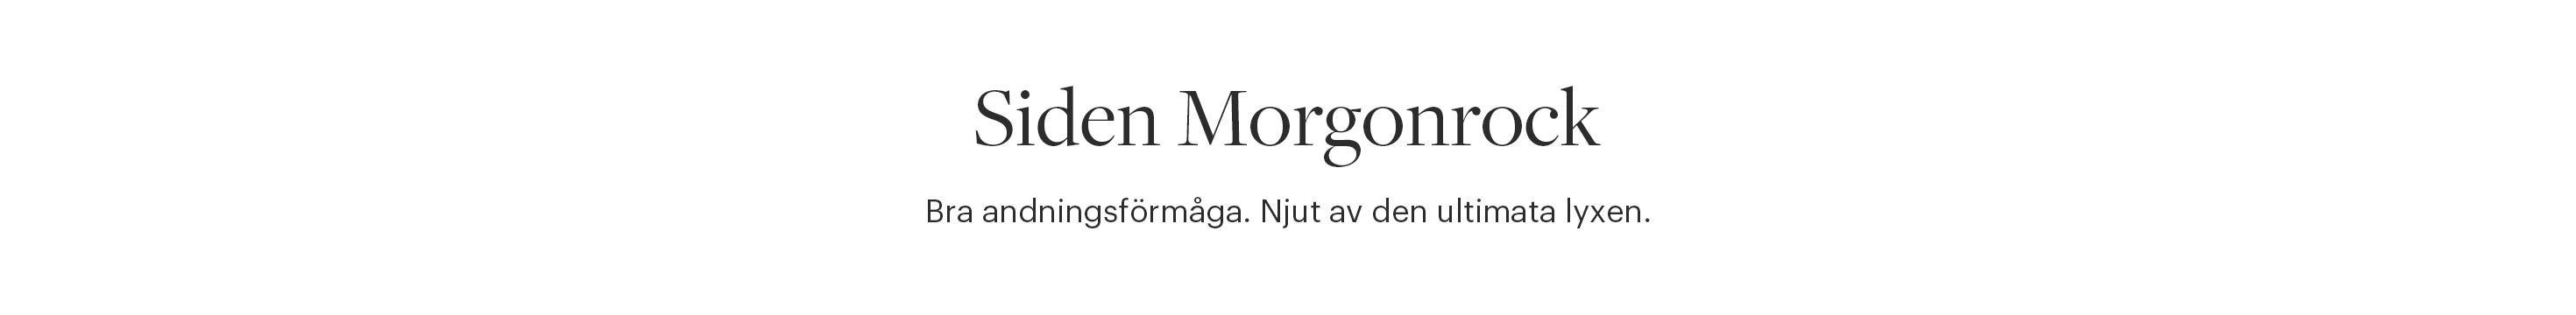 Siden Morgonrock Dam